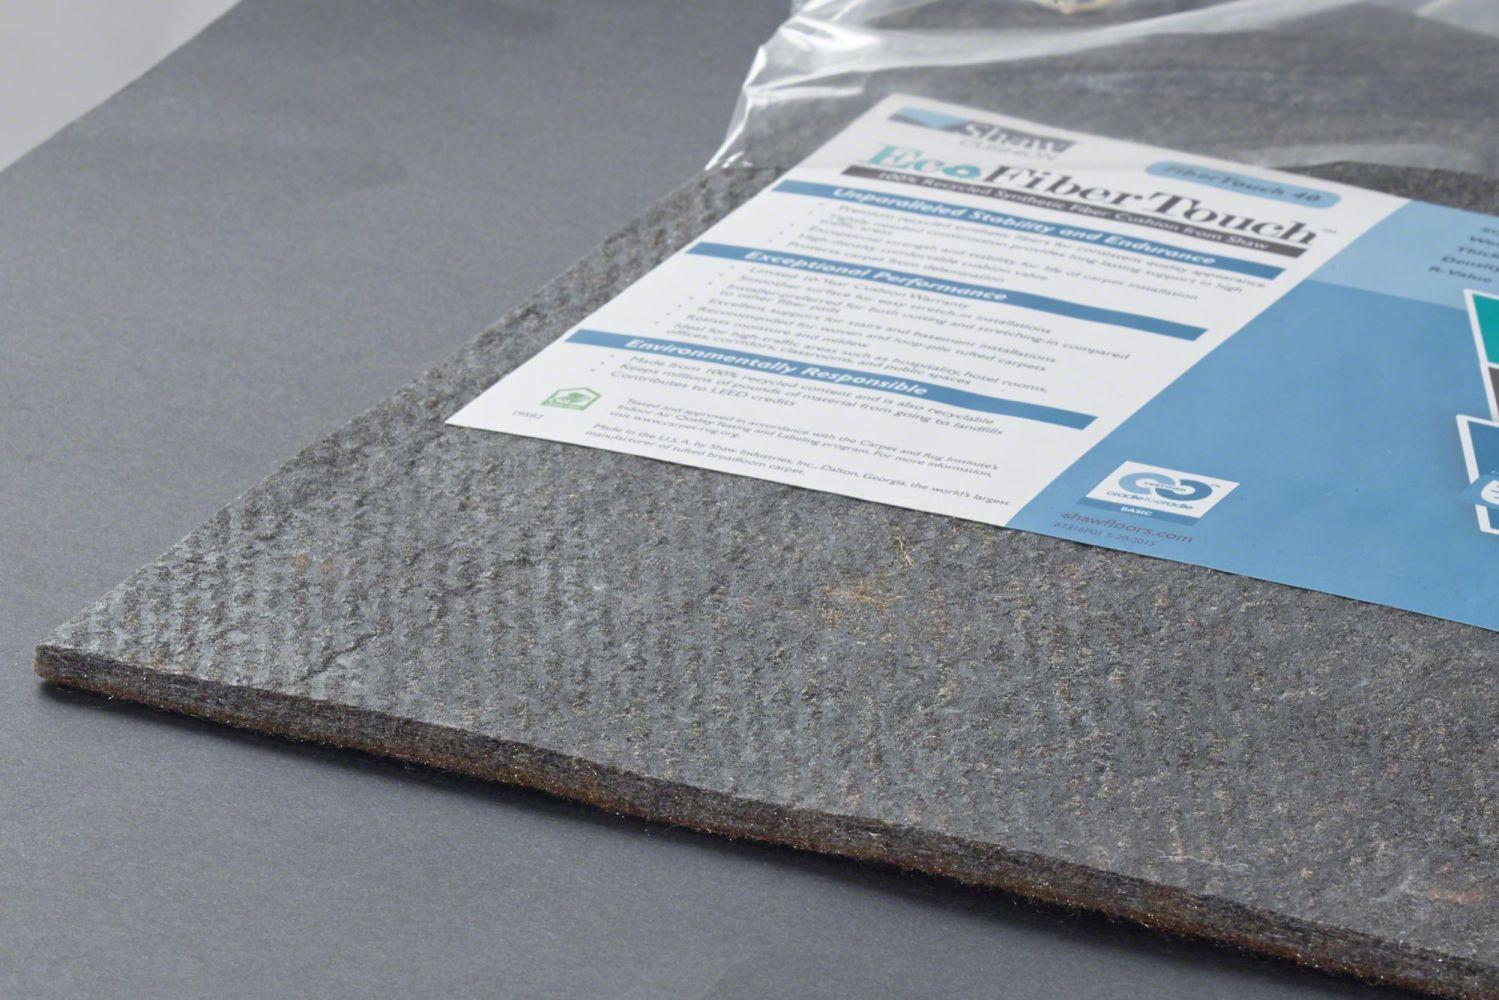 Shaw Floors Eco Edge Cushion Fibertouch 40-12 Grey 00001_403FT